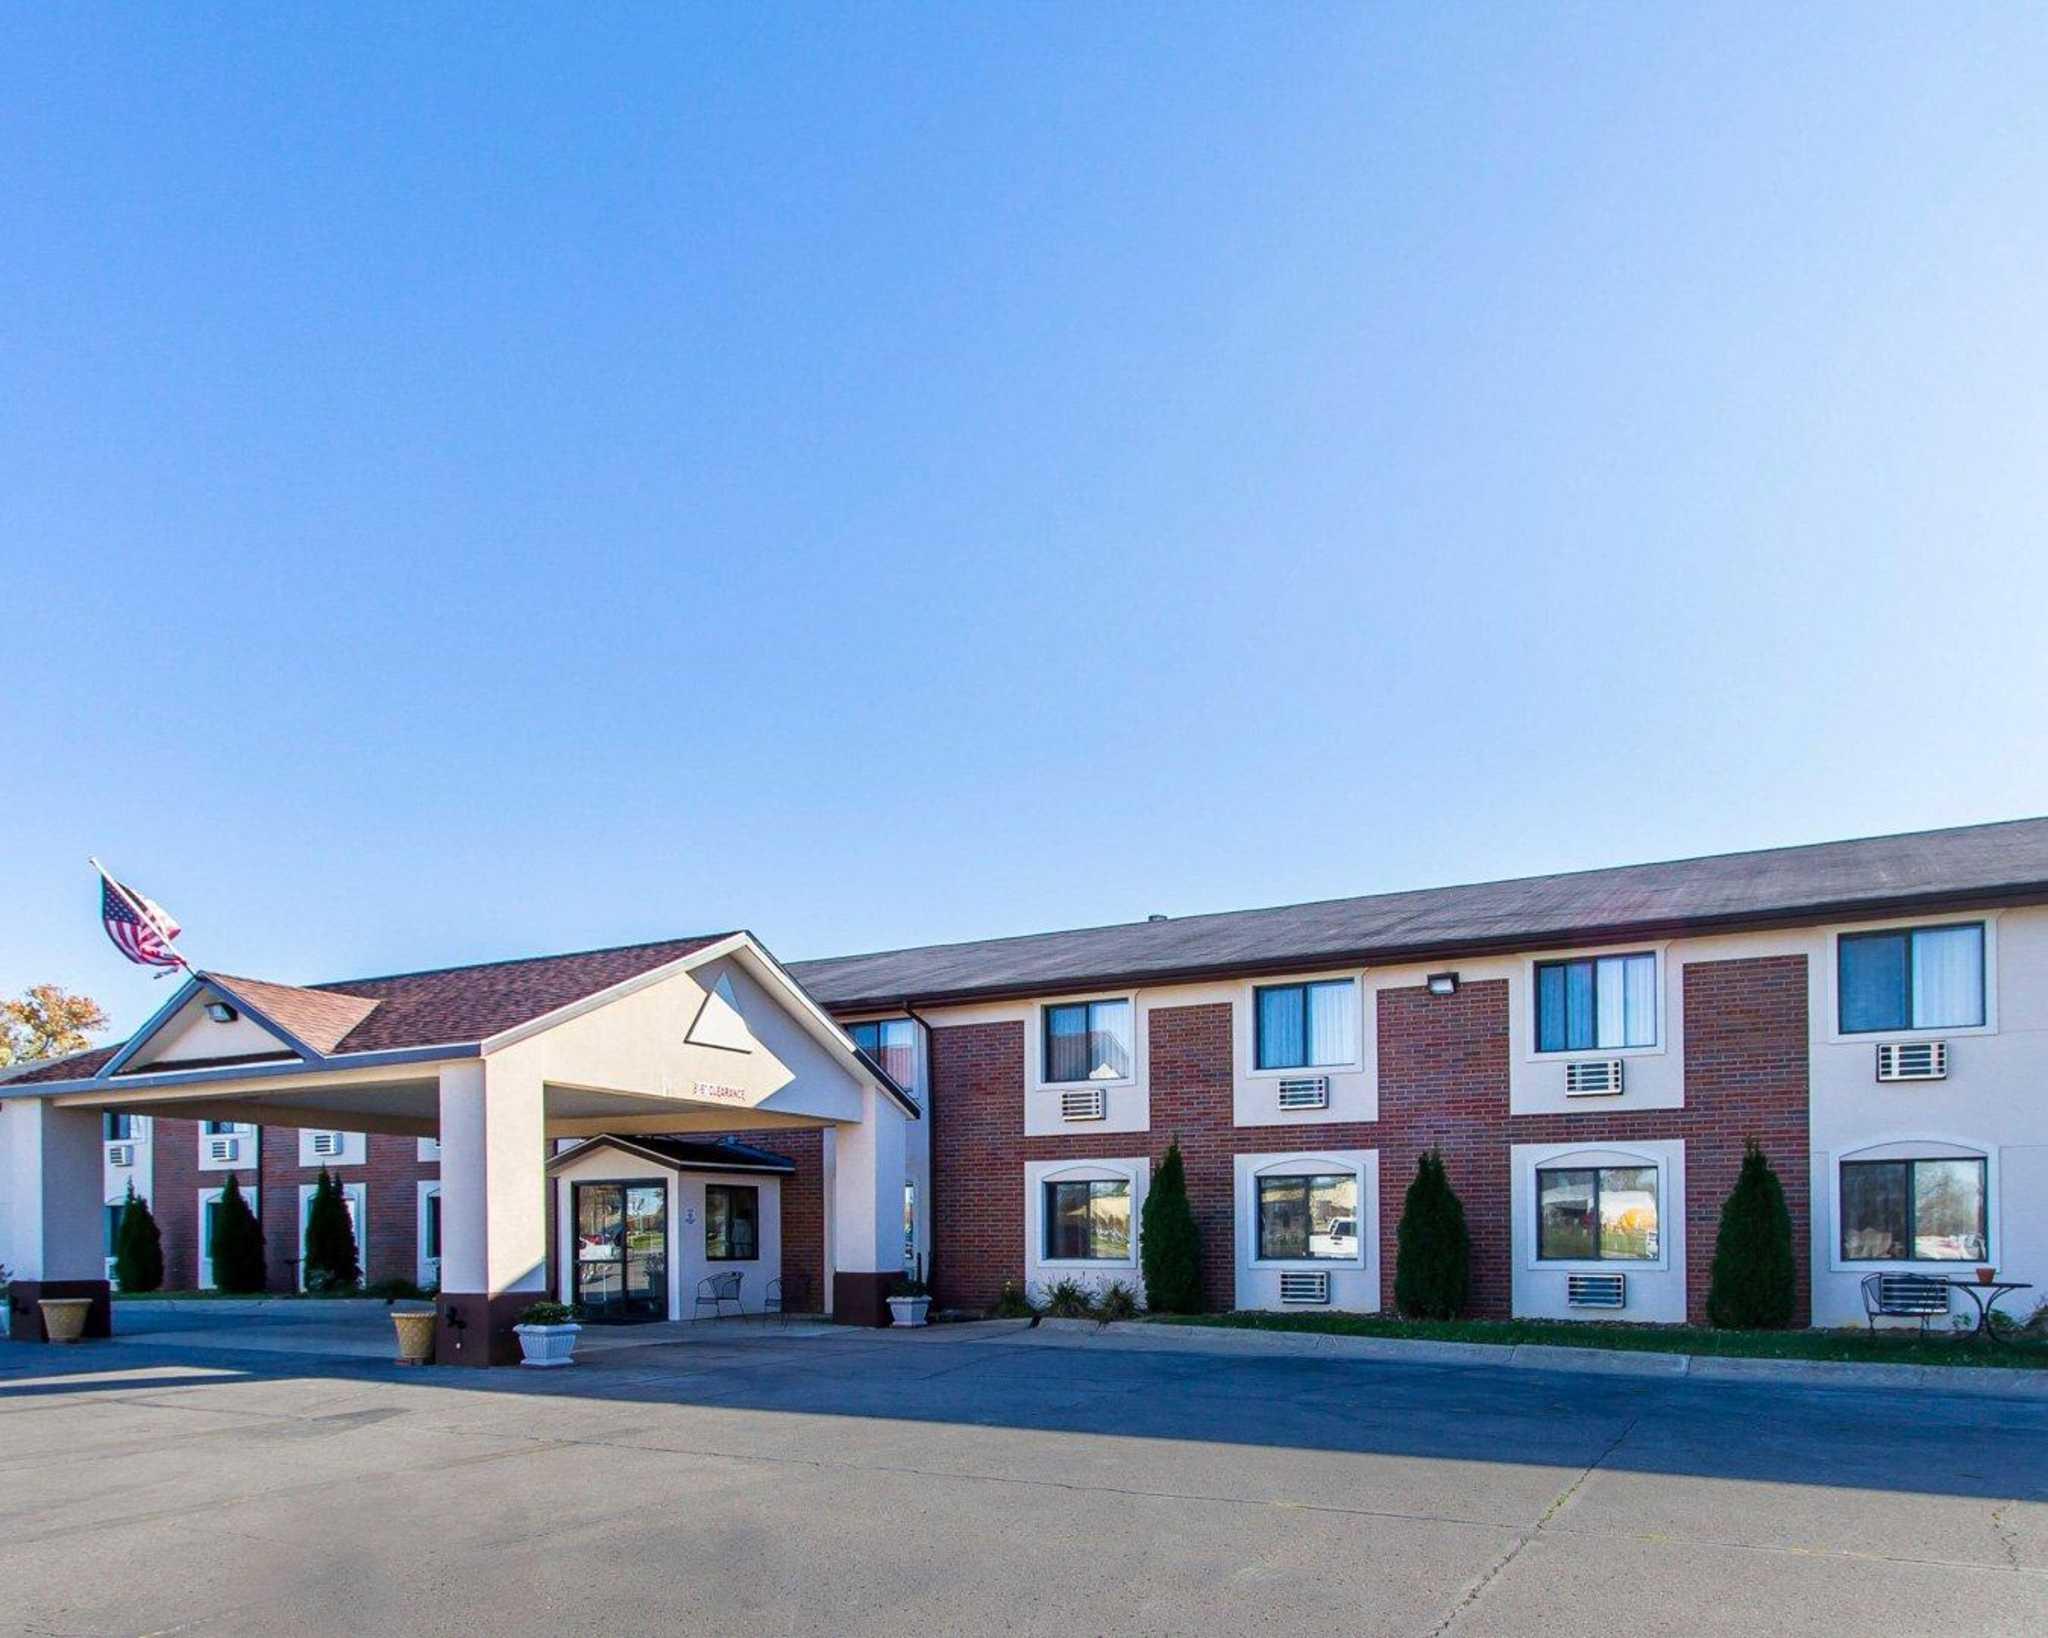 Quality Inn & Suites image 1